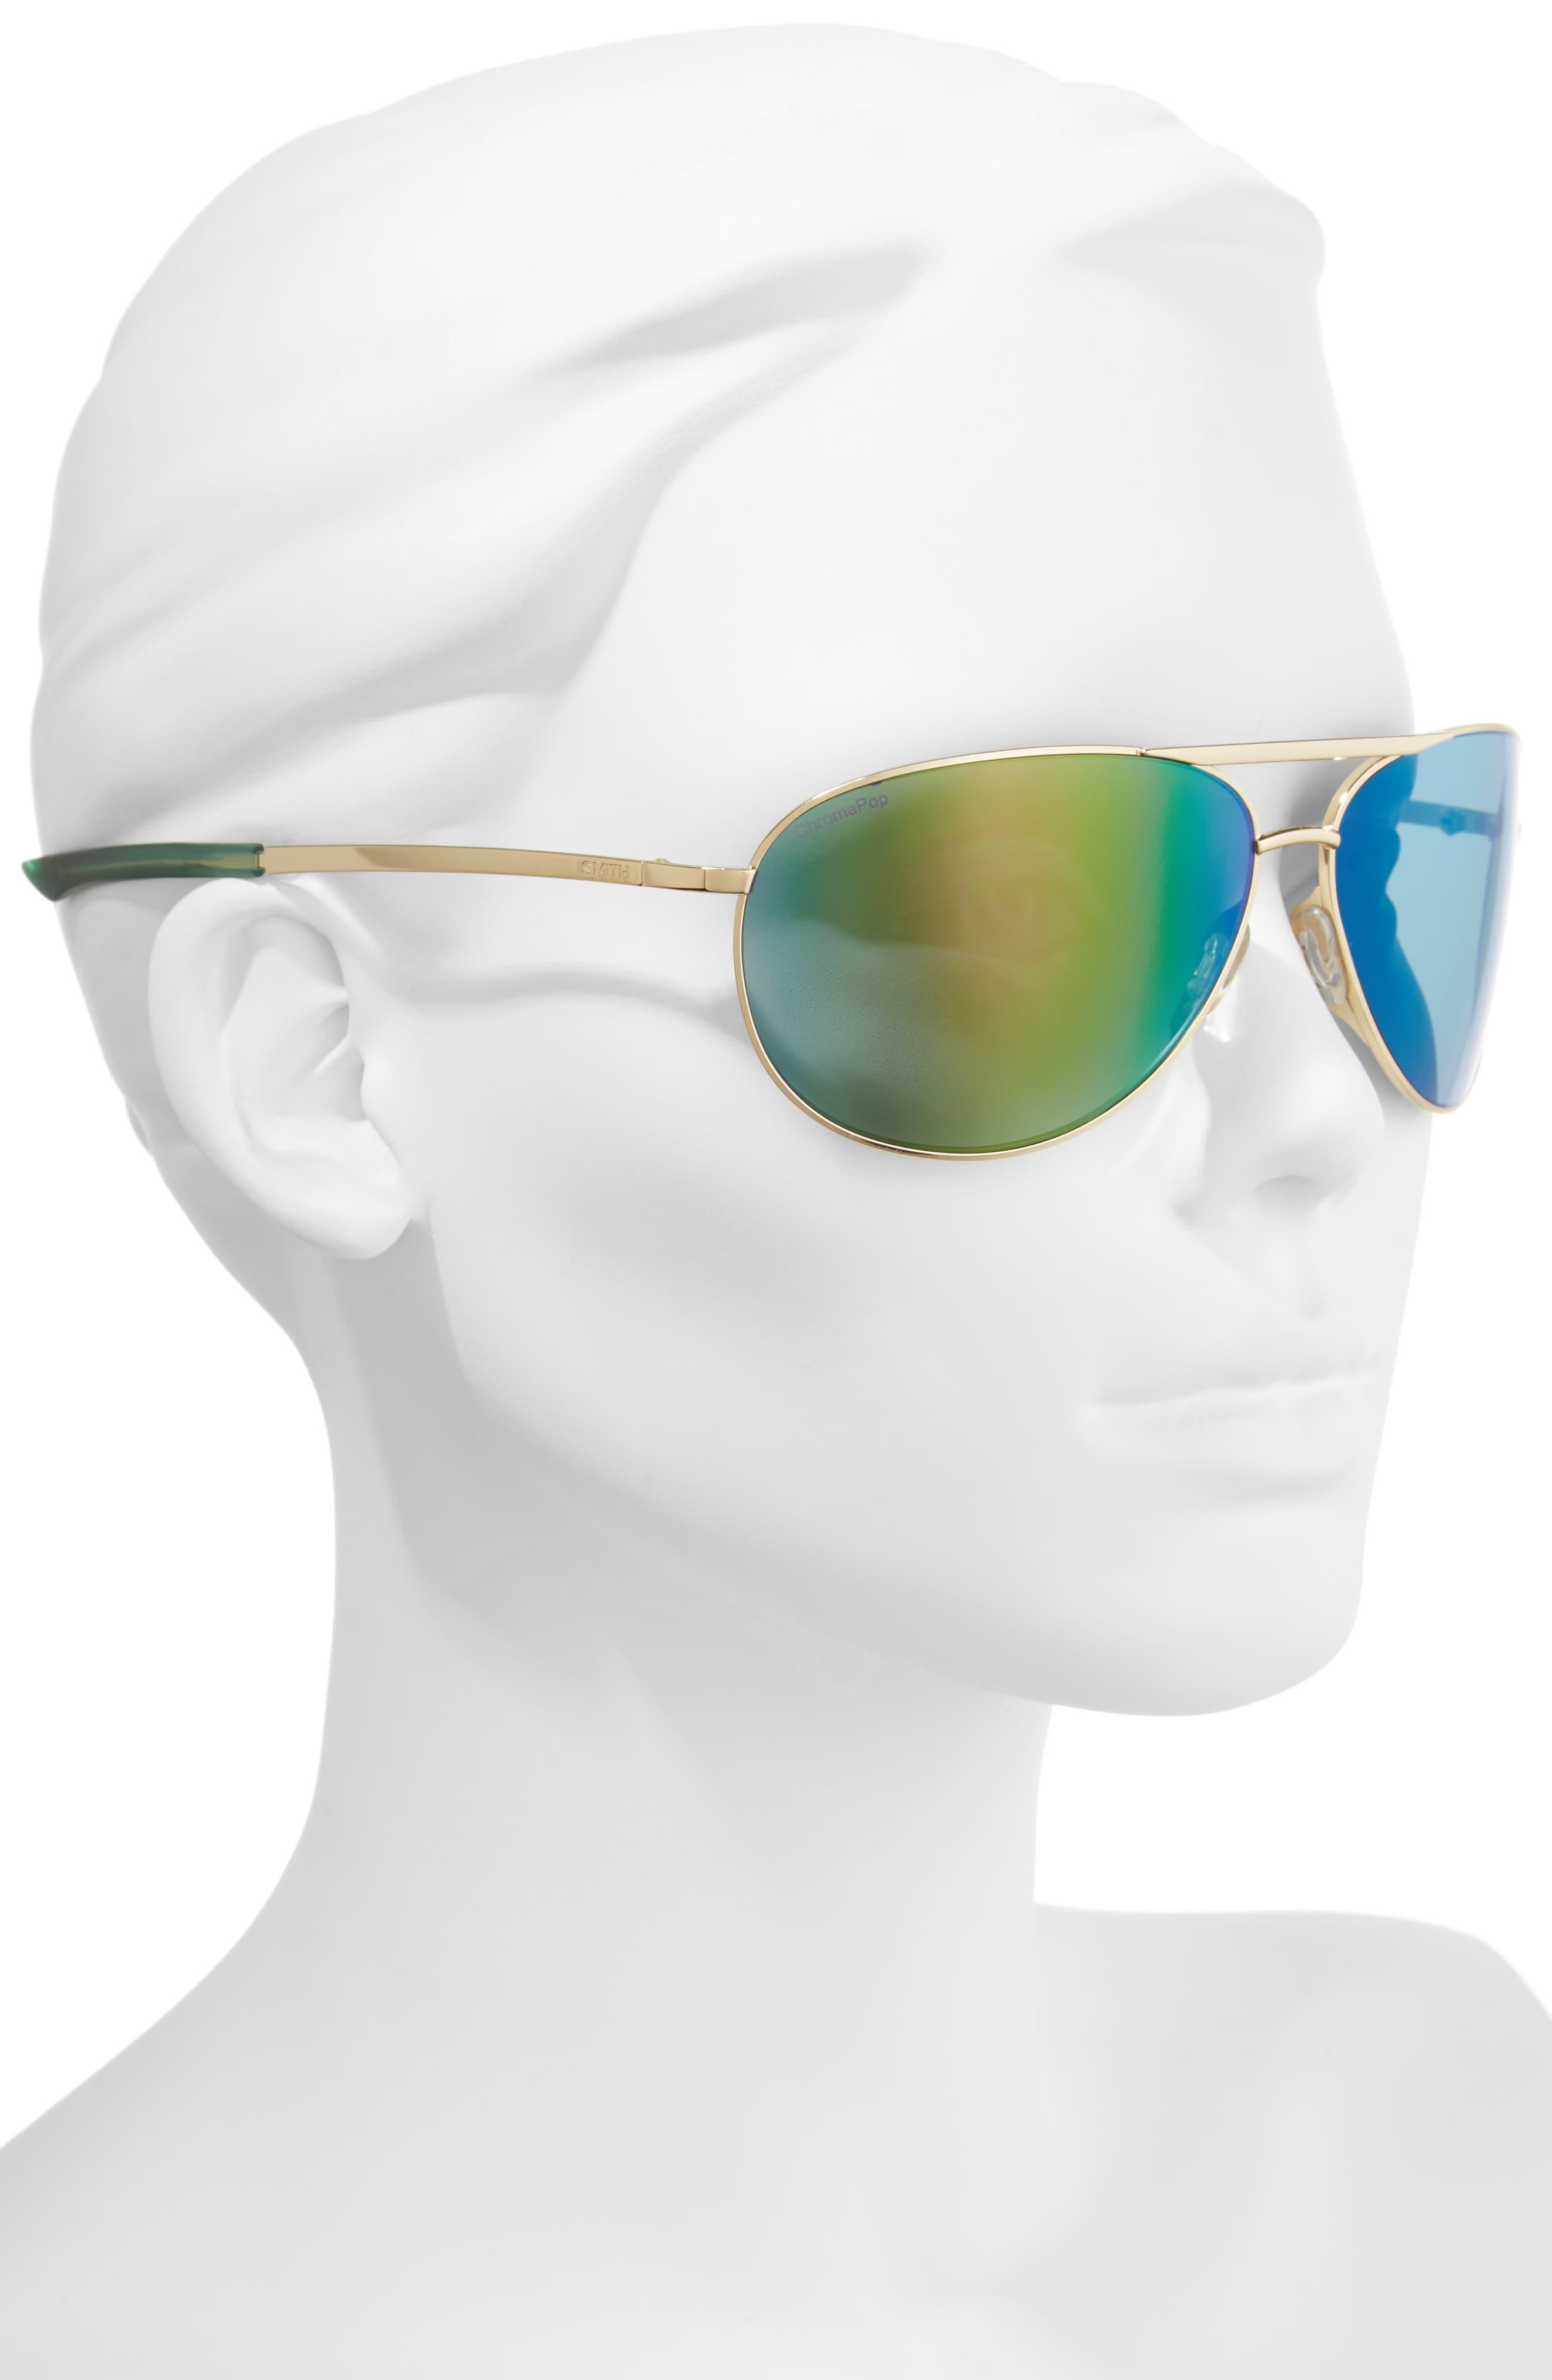 Serpico 2 65mm Mirrored ChromaPop<sup>™</sup> Polarized Aviator Sunglasses,                             Alternate thumbnail 2, color,                             Gold/ Green Mirror